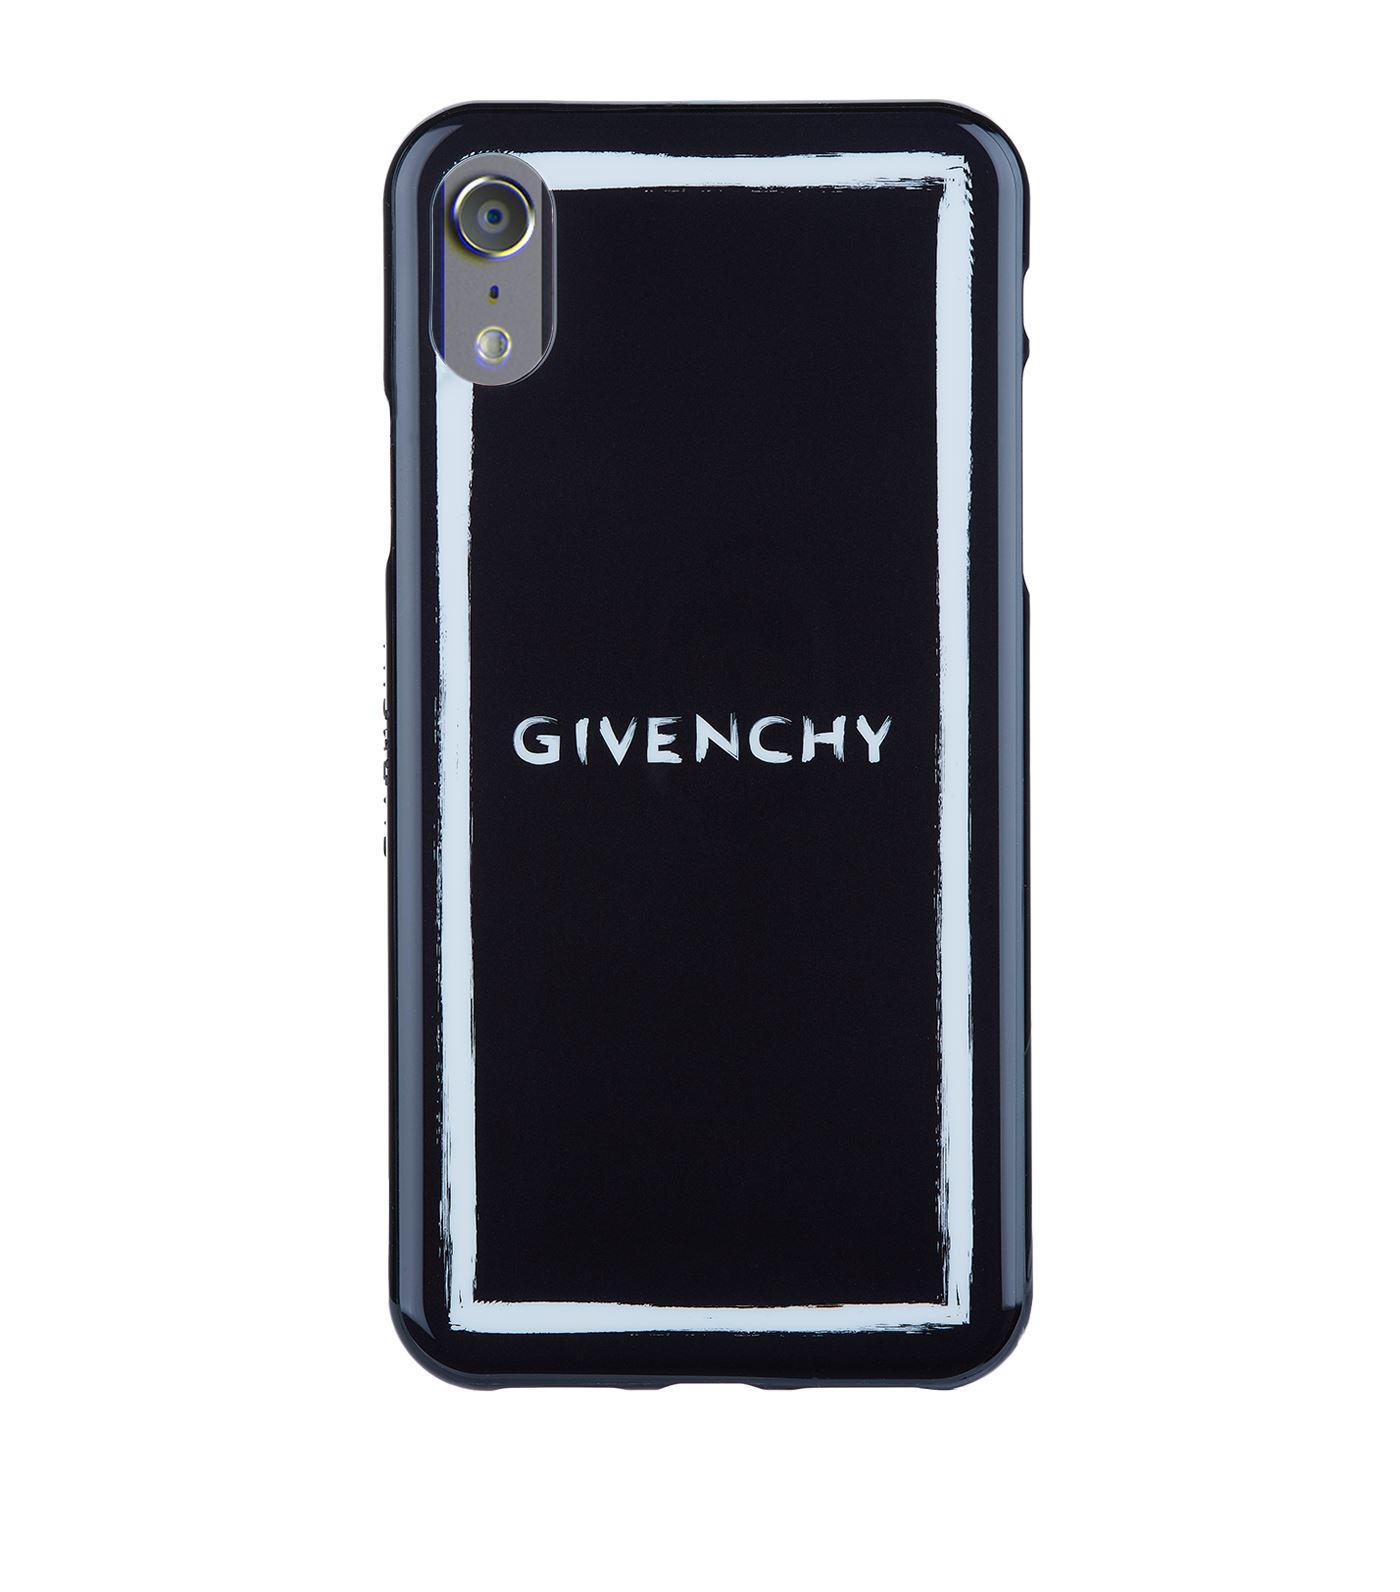 online retailer bc0a3 babeb Givenchy Black Paint Sketch Iphone X Case